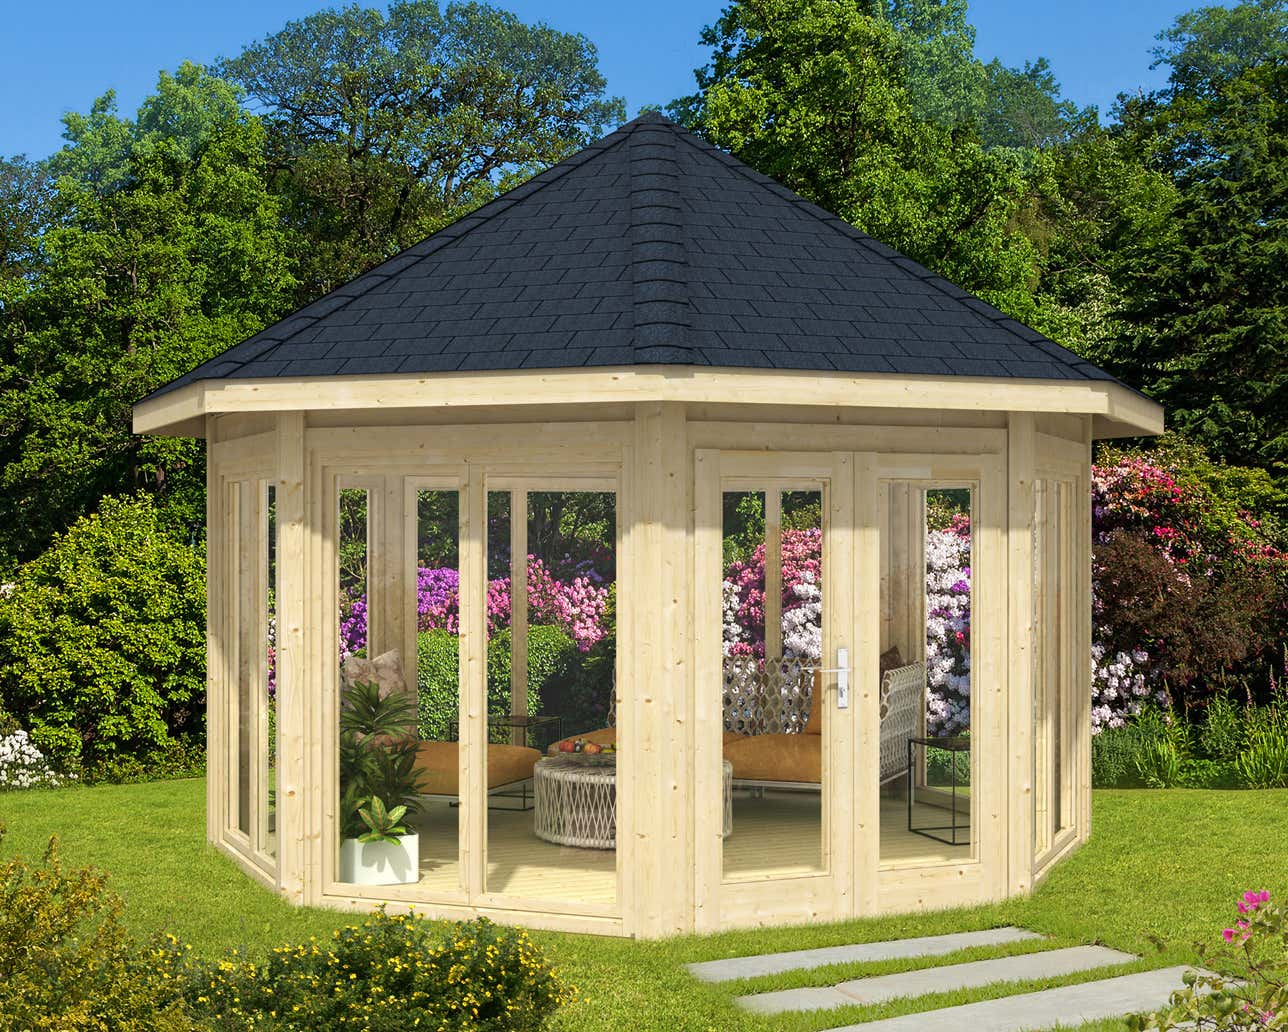 gartenhaus sylt aufbauanleitung my blog. Black Bedroom Furniture Sets. Home Design Ideas